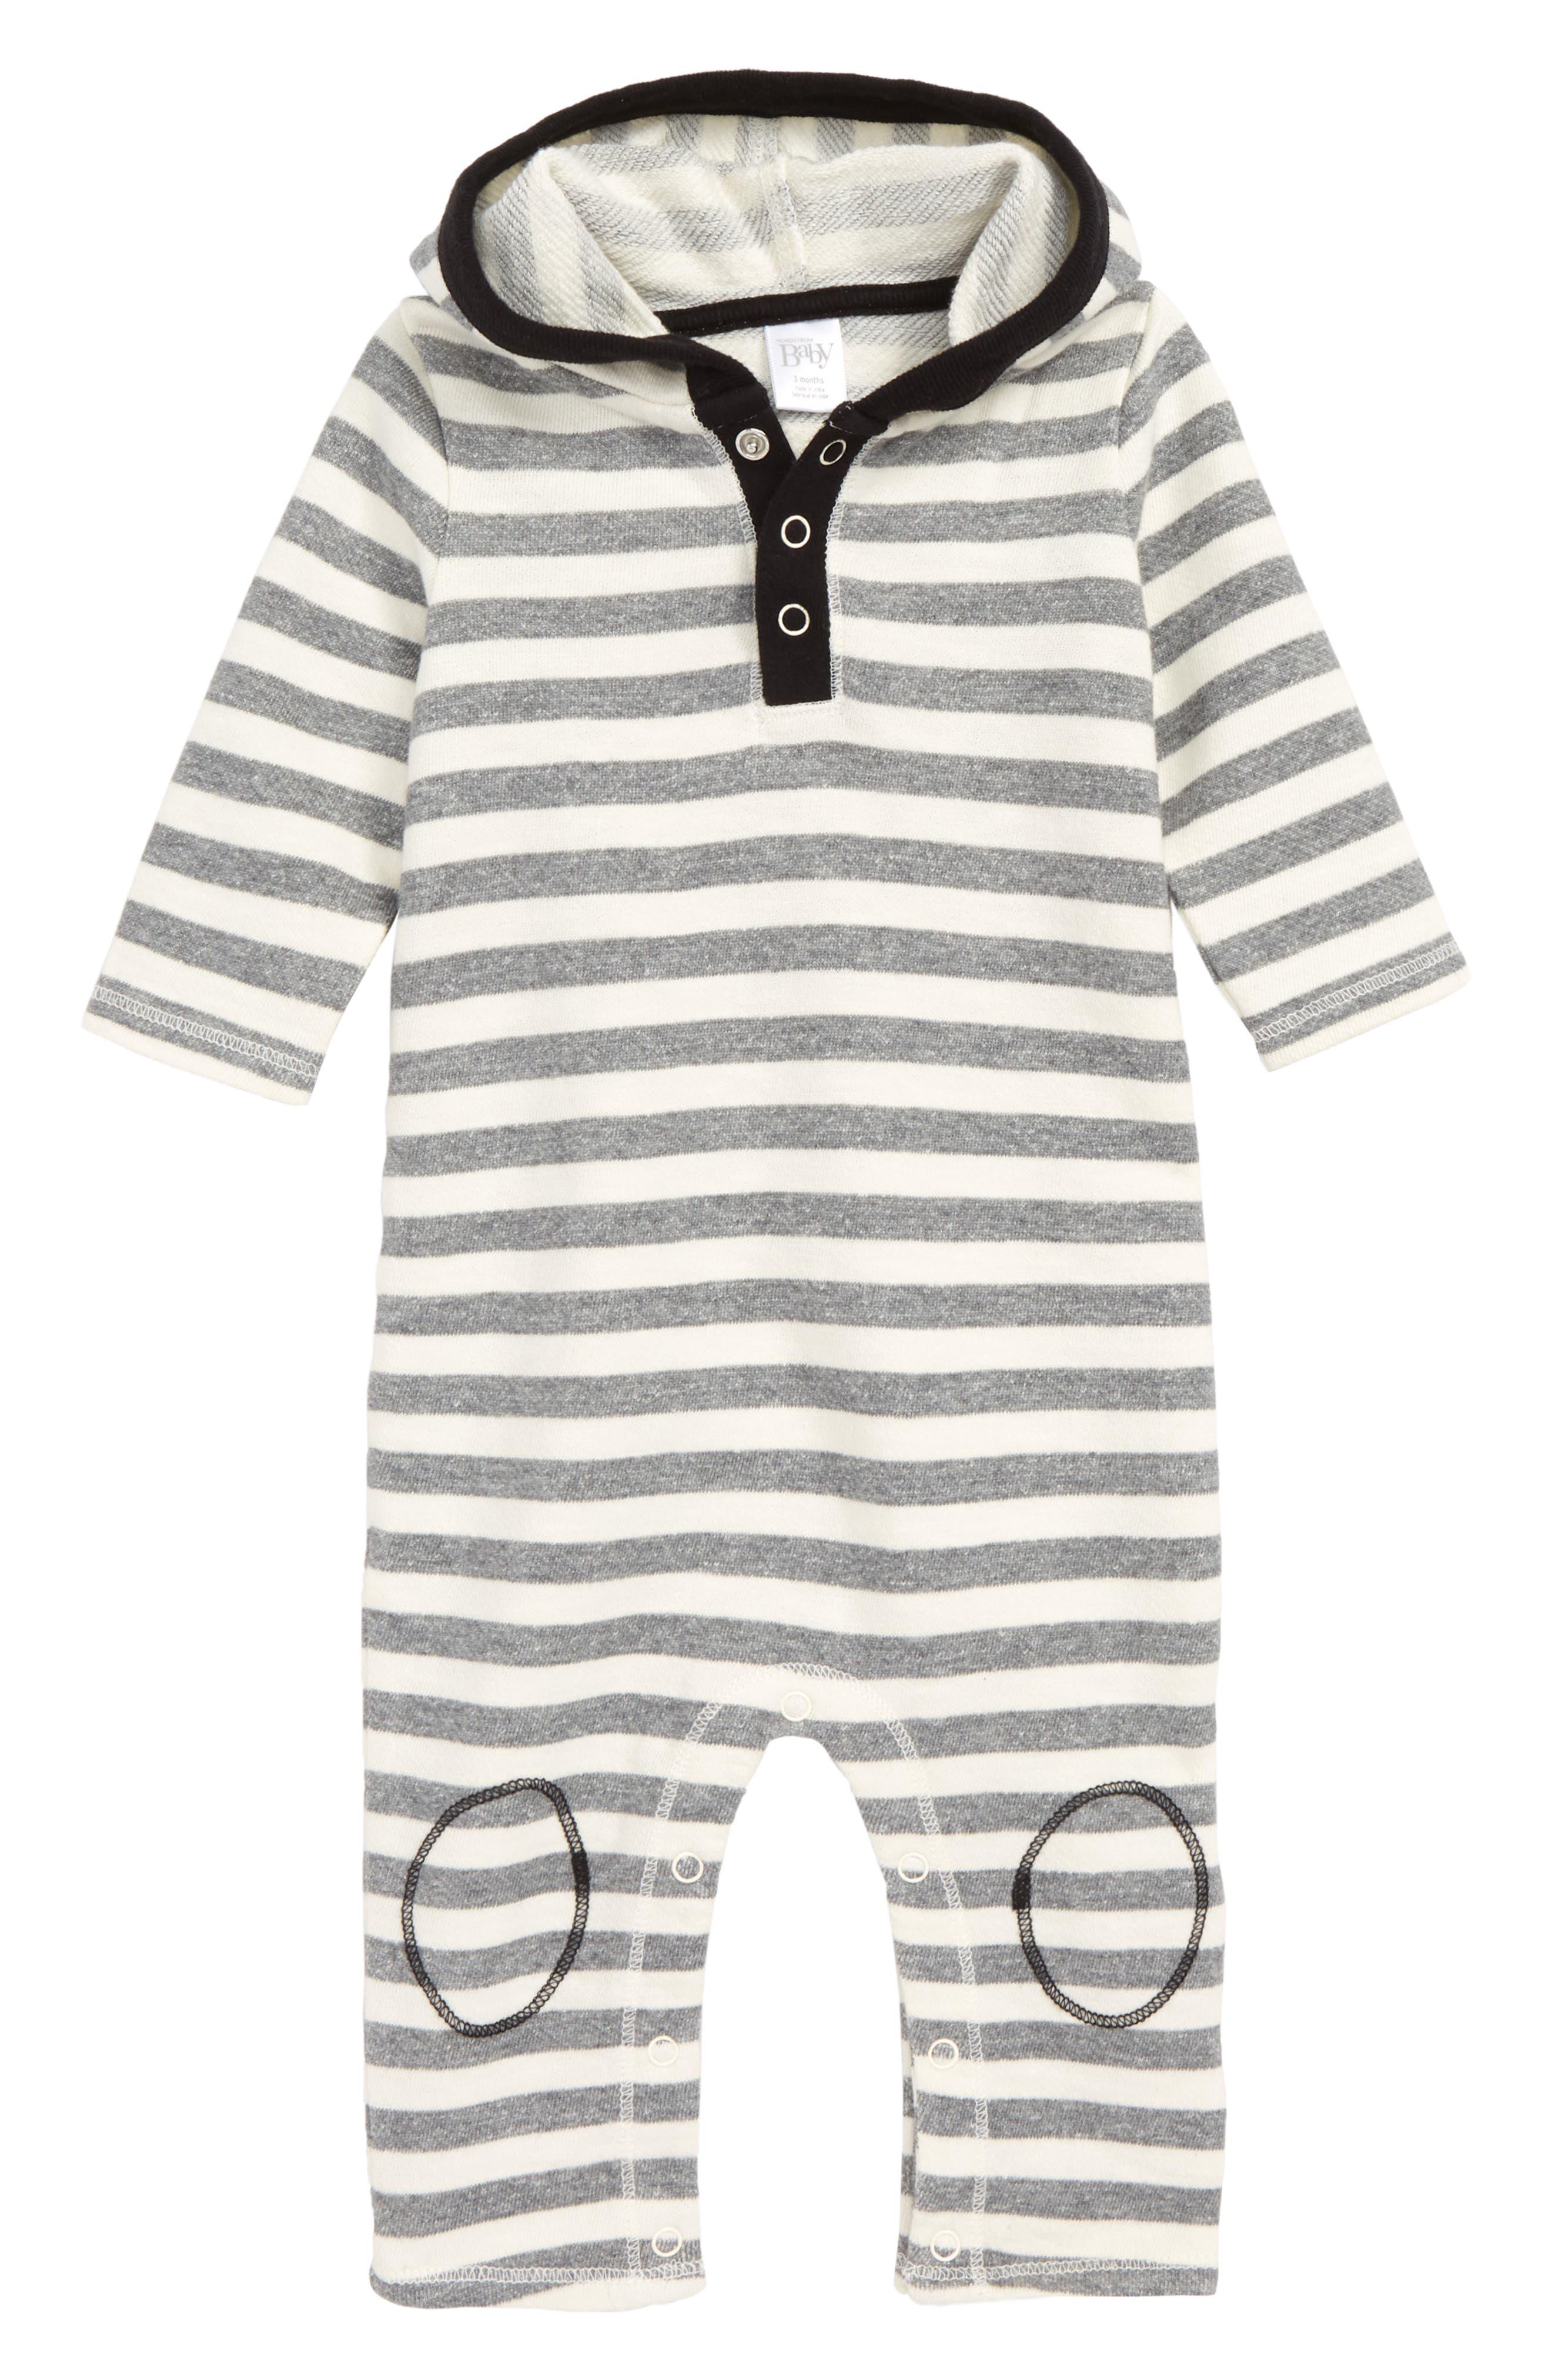 NORDSTROM BABY, Stripe Hooded Romper, Main thumbnail 1, color, 900